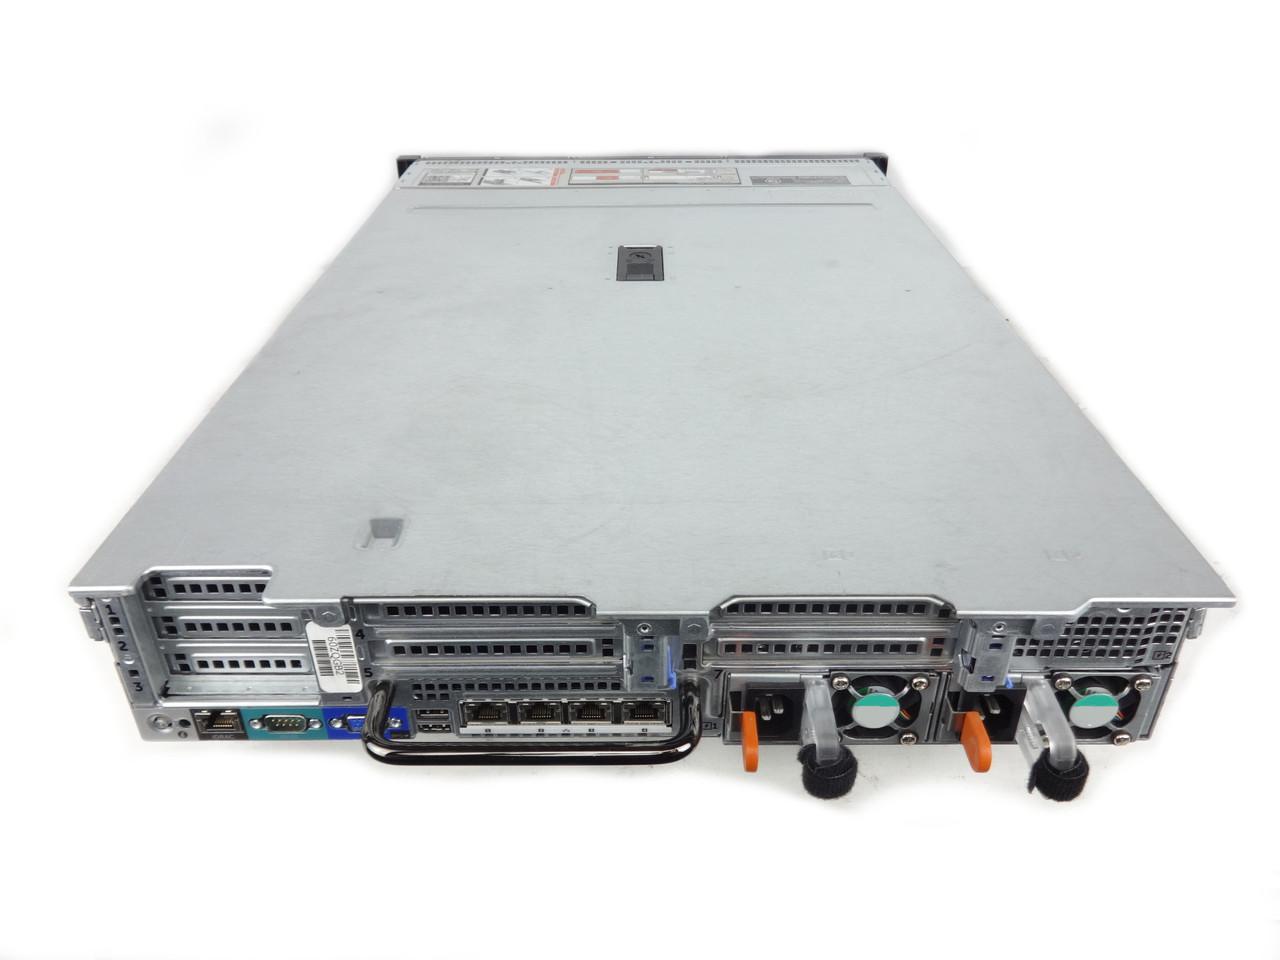 Dell Poweredge R730 16 Bay Server(Rear)